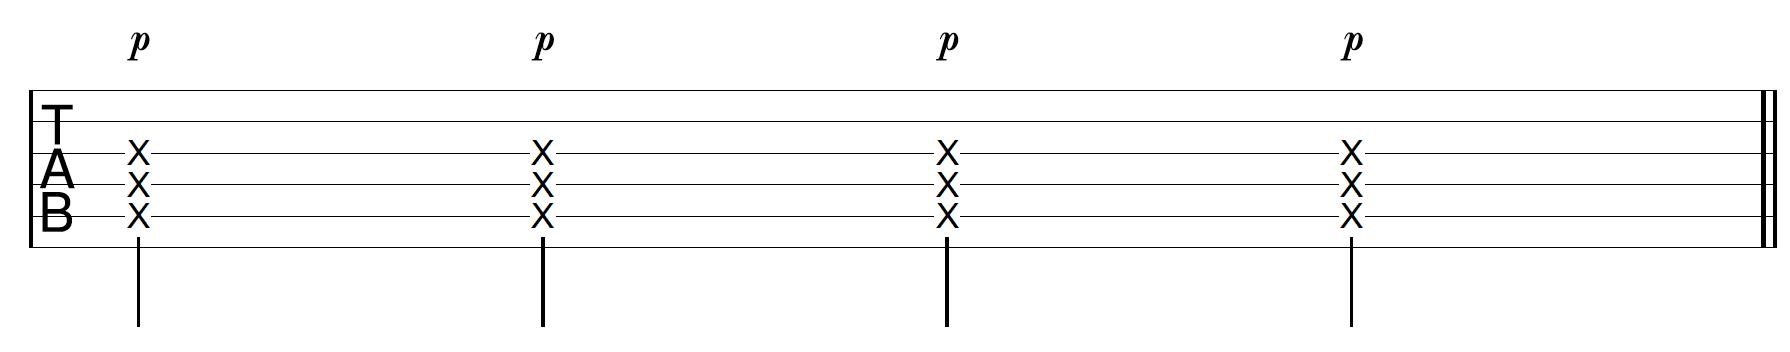 Thumb Slap Guitar Technique